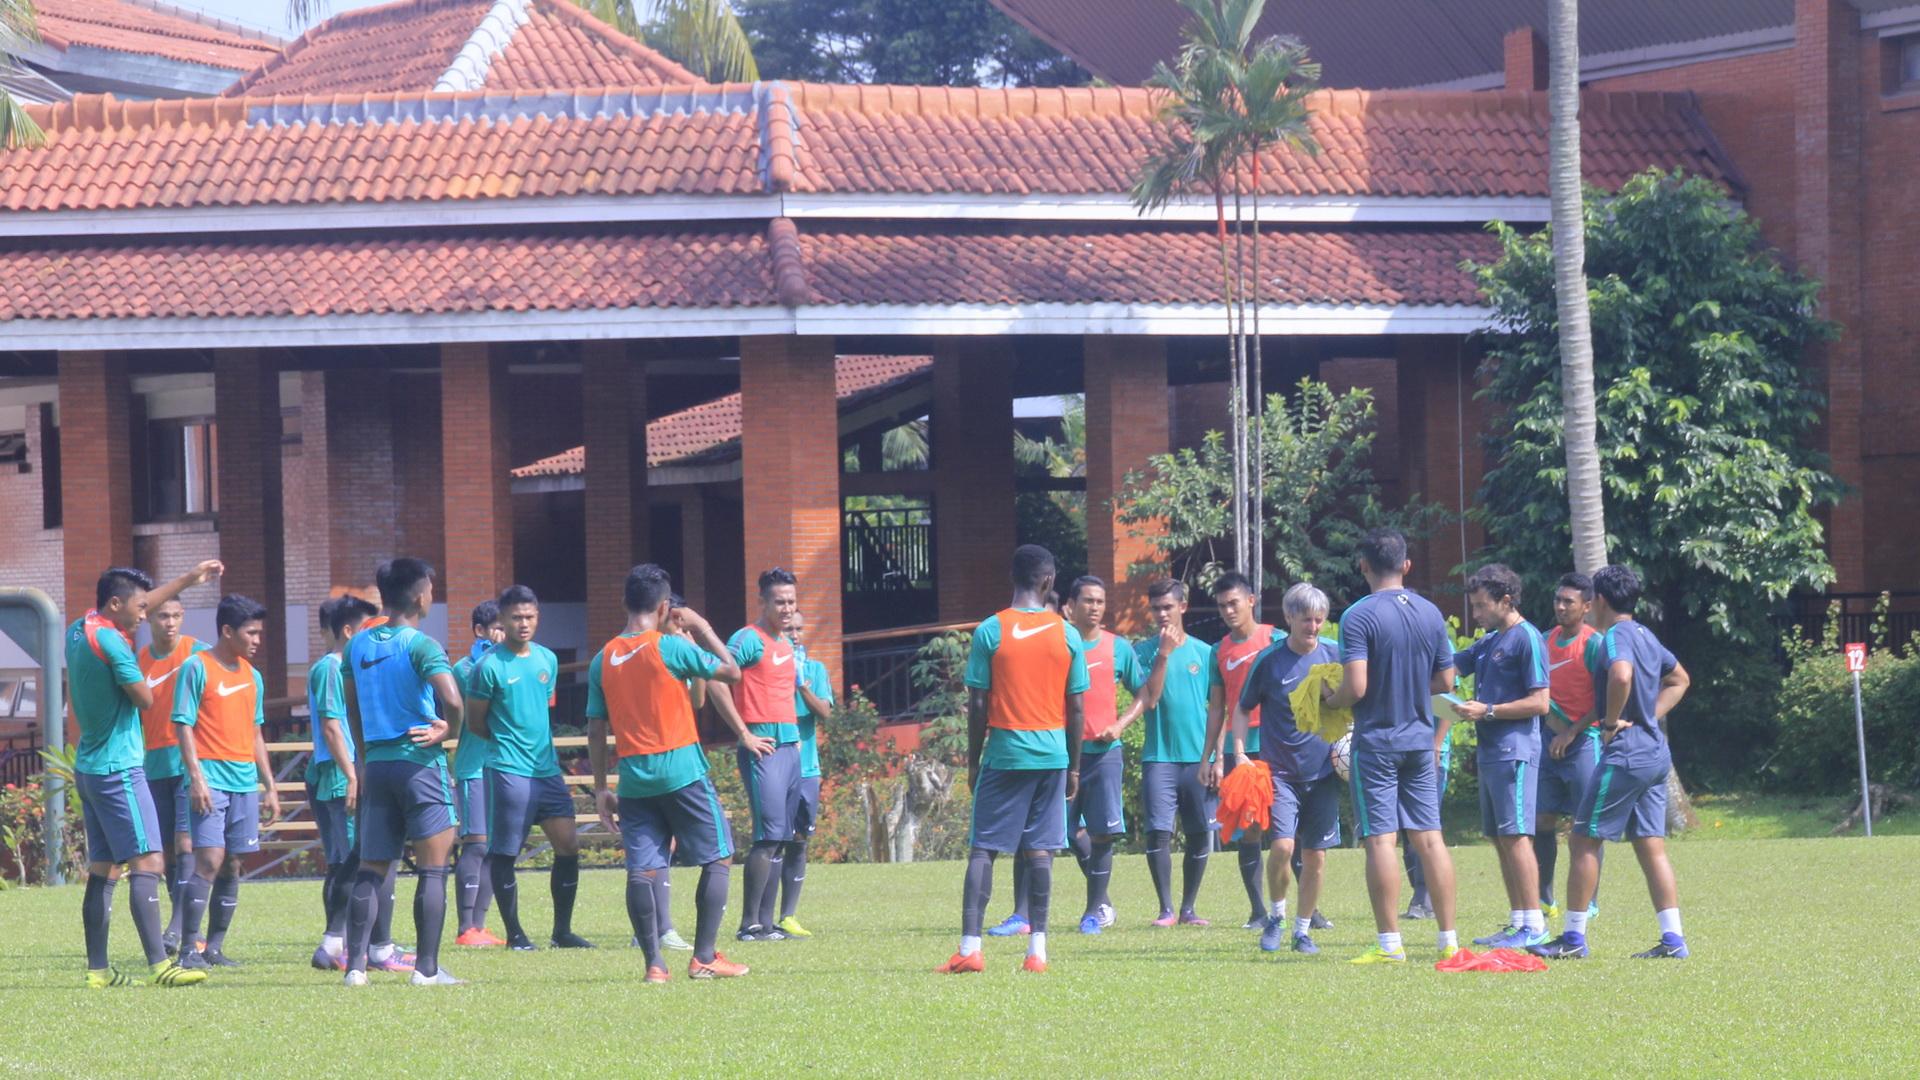 Timnas U22: Seleksi Timnas Indonesia U-22 Tahap Kedua Dinilai